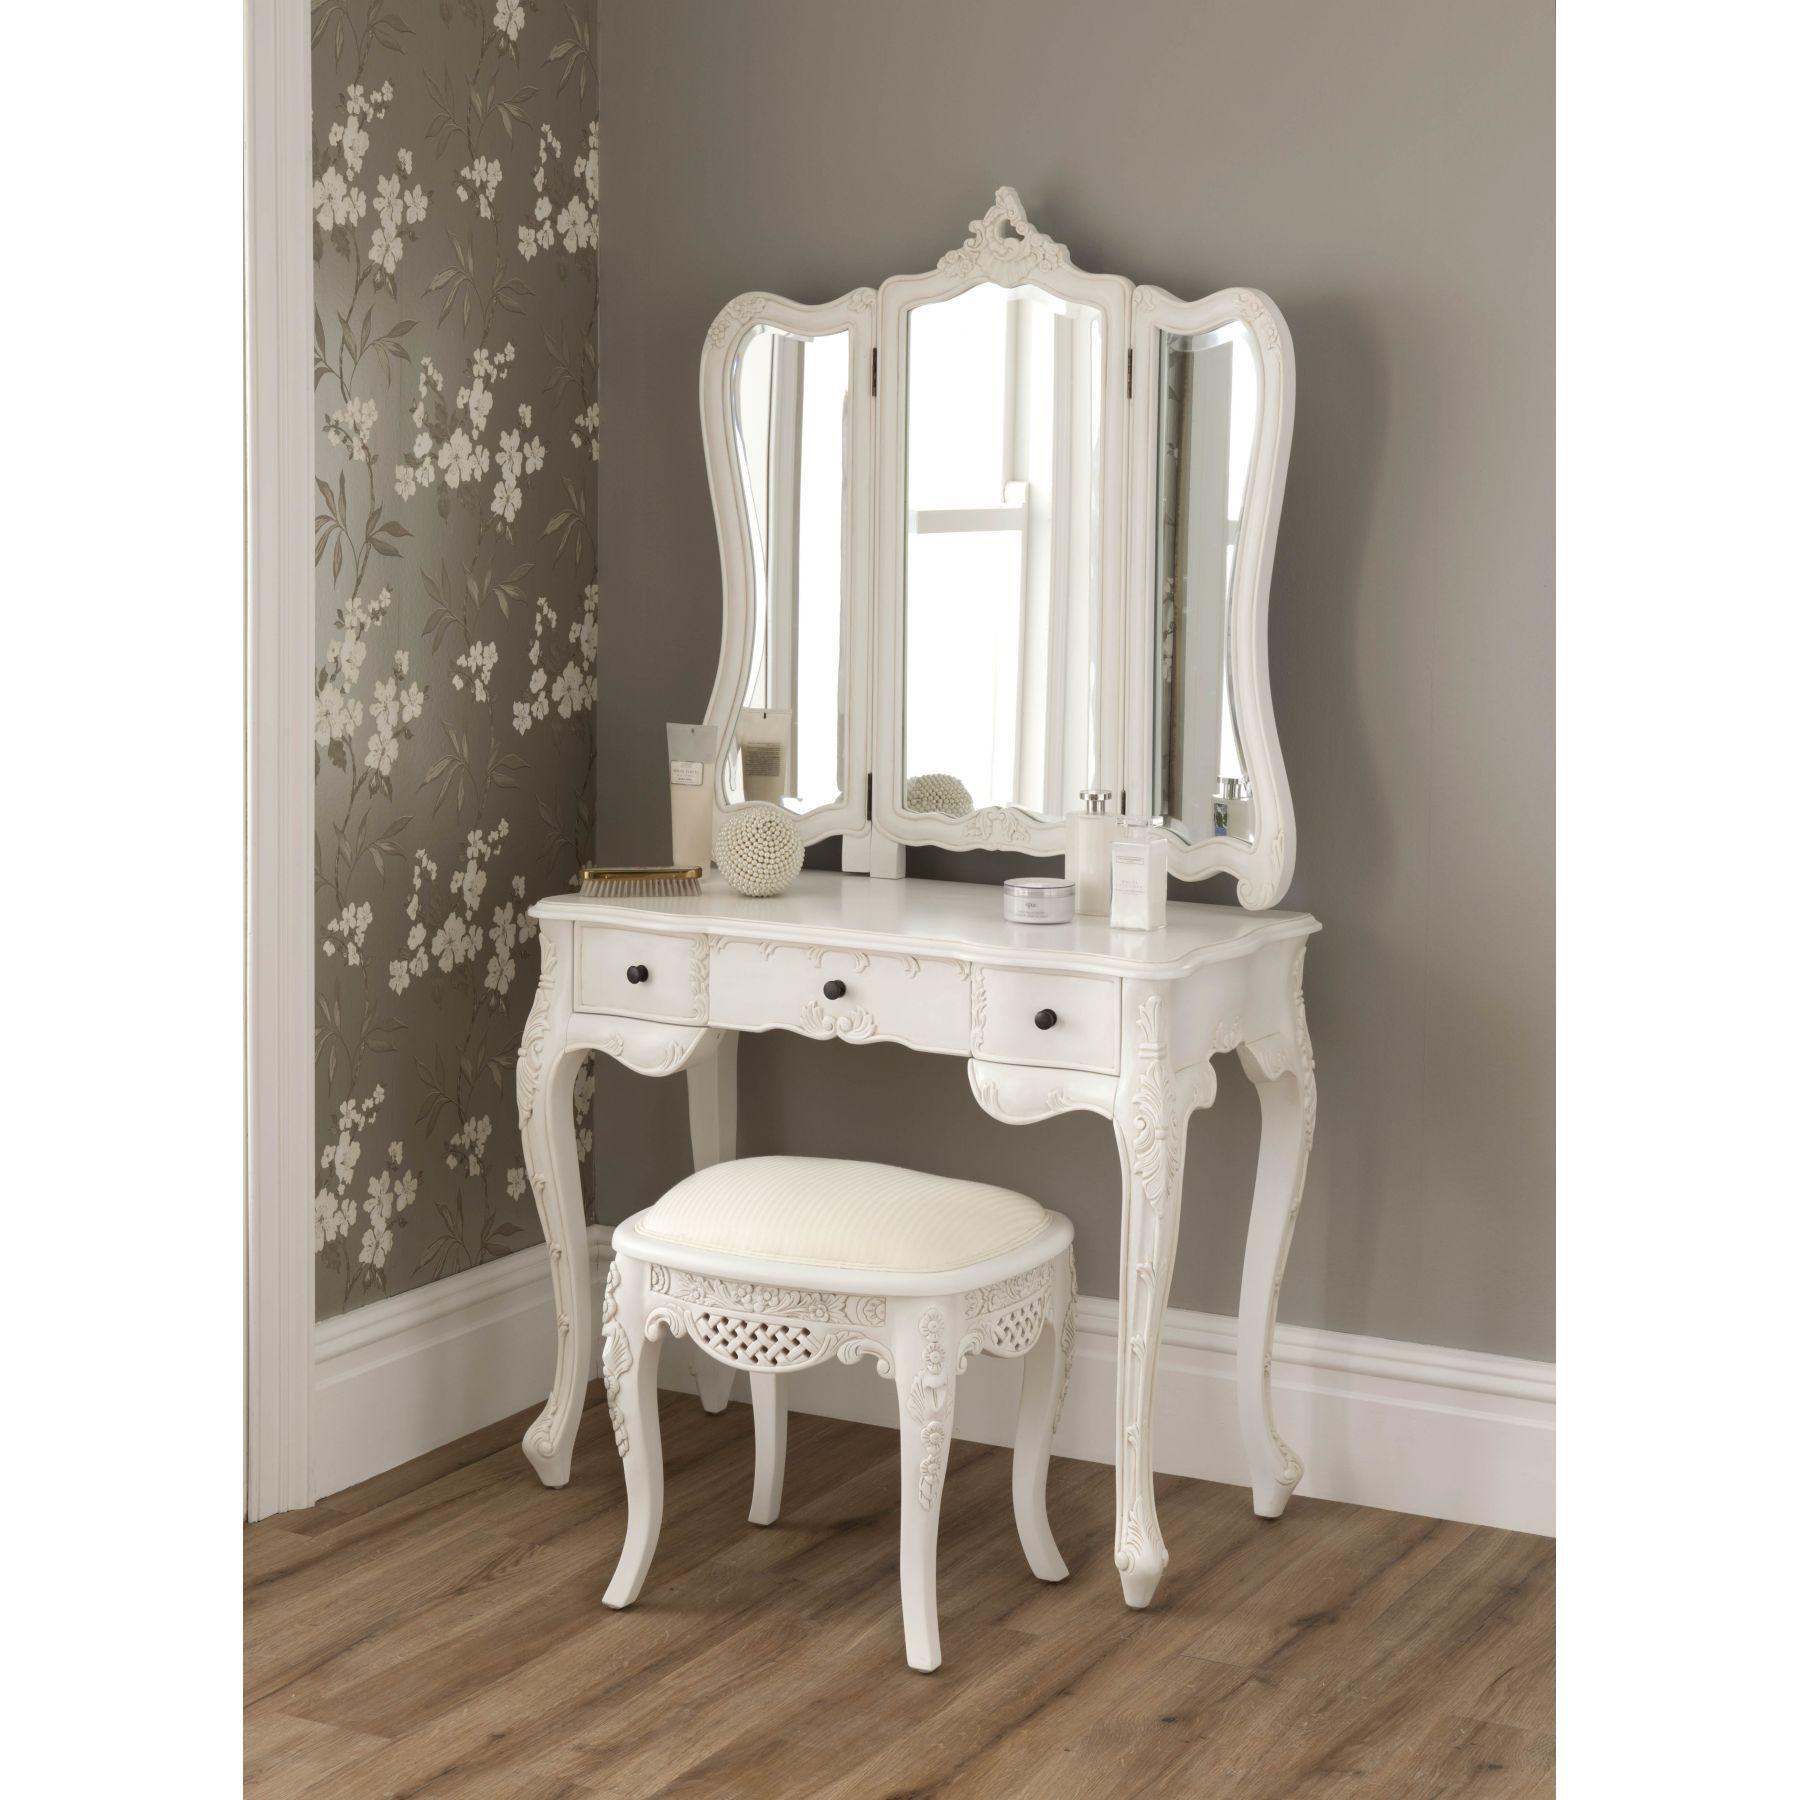 Rustic White Wooden Makeup Vanity Bedroom Enchanting Design Ideas Furniture Pinterest Dressing Tables